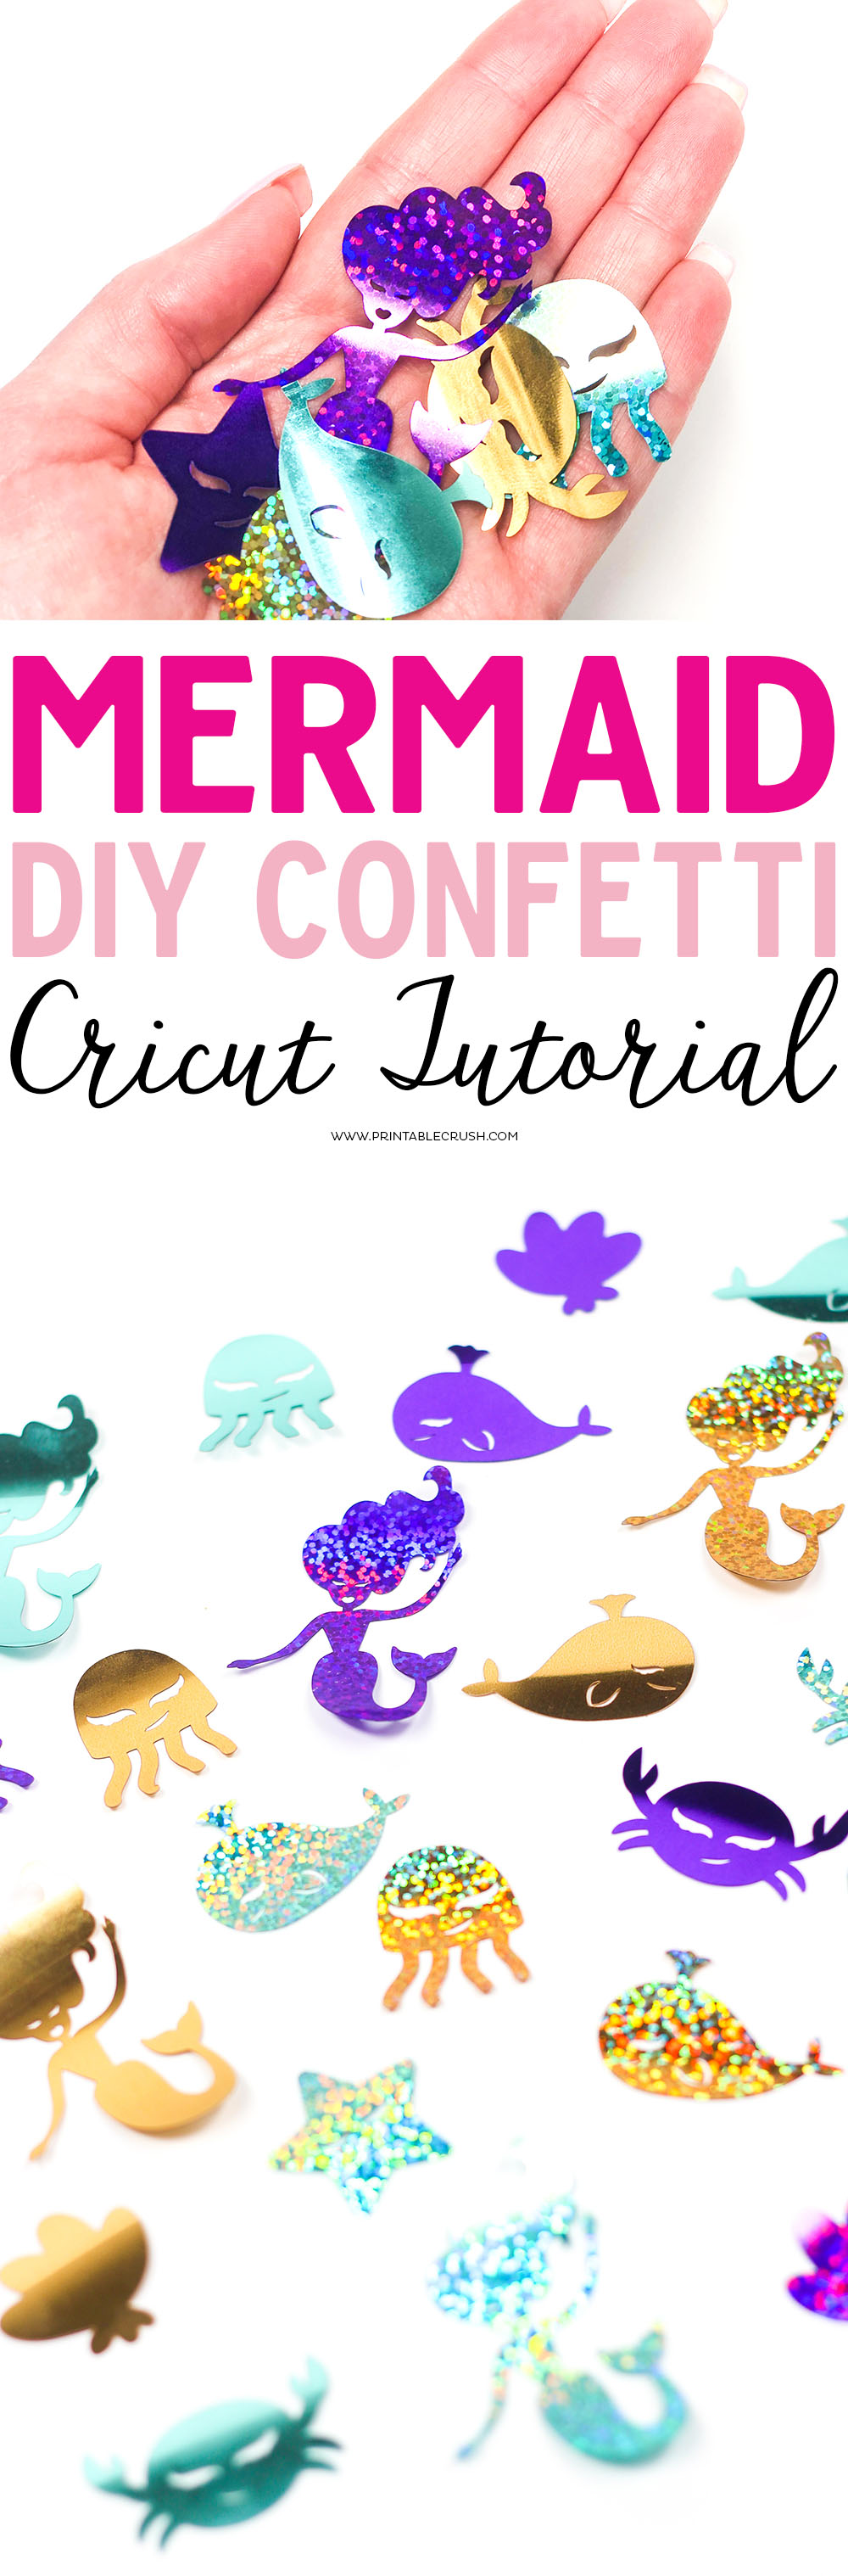 Diy Mermaid Confetti Cricut Tutorial Printable Crush